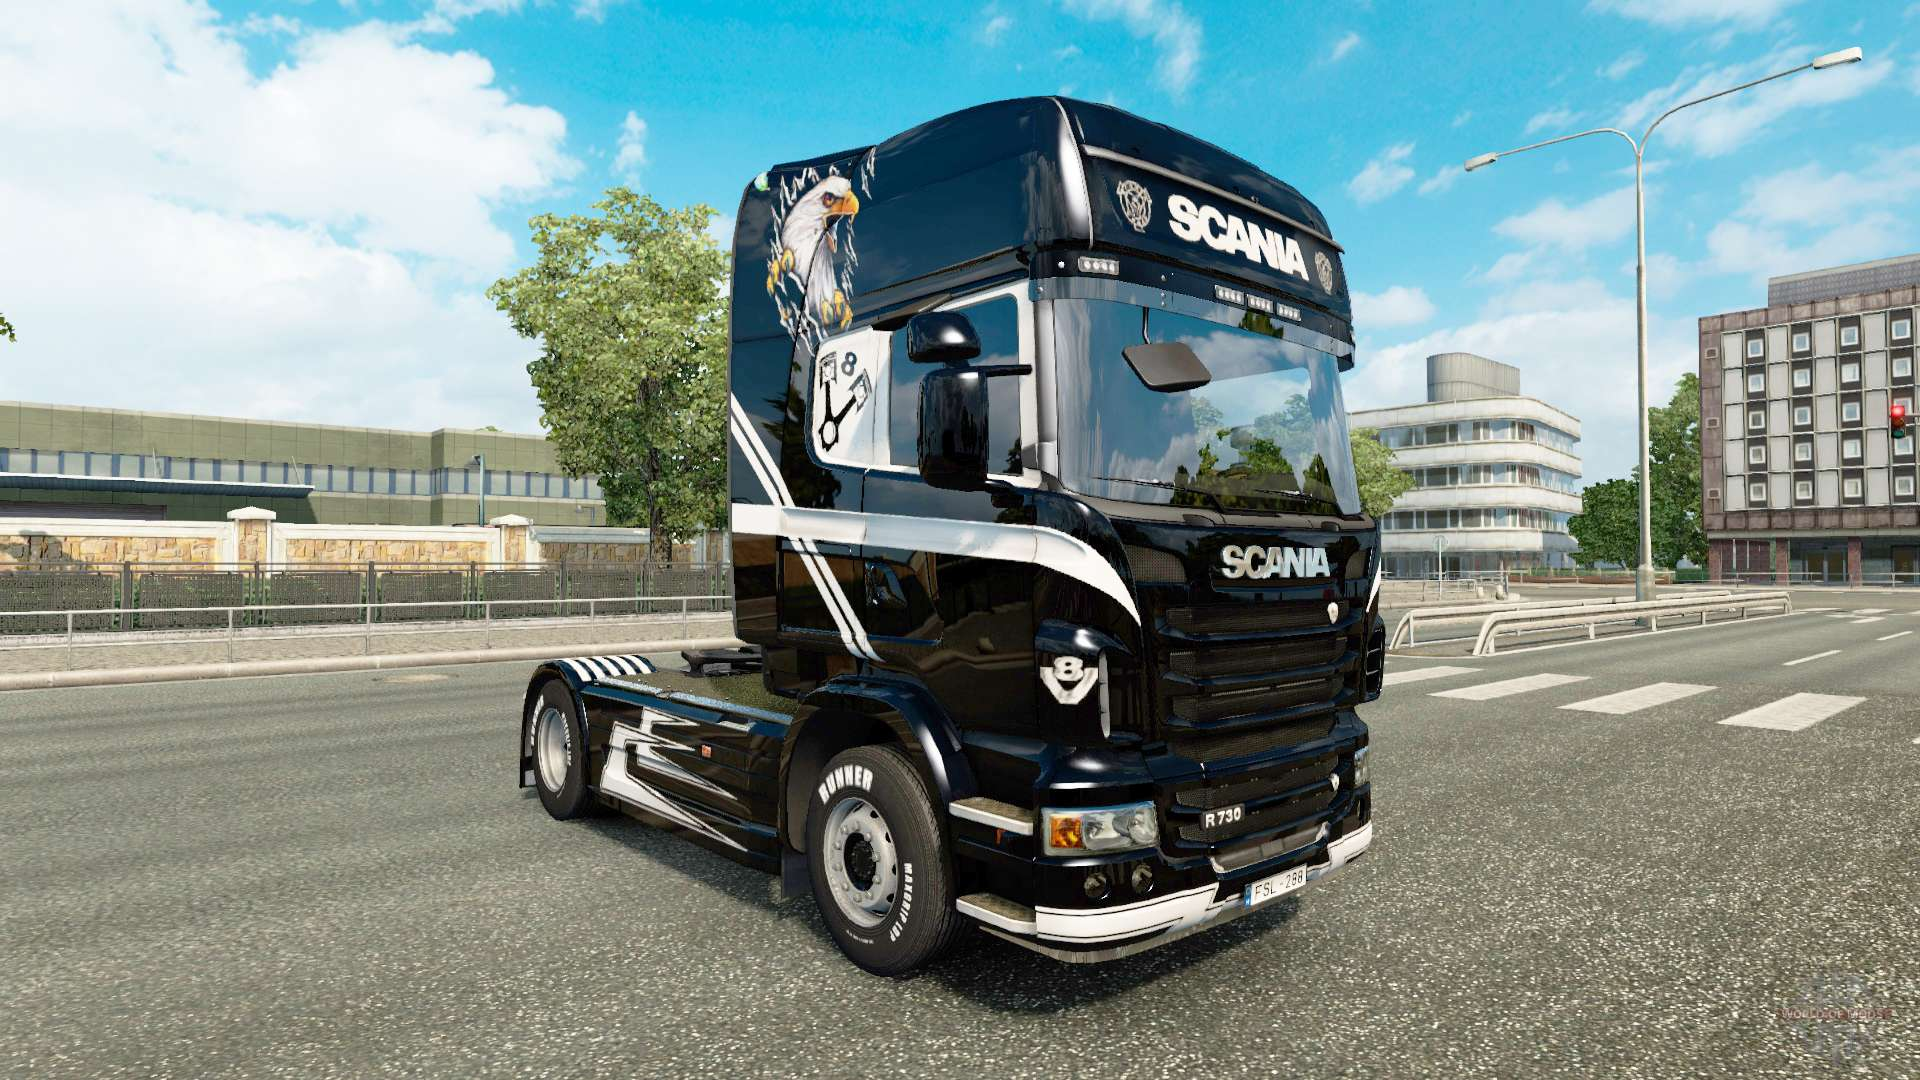 v8 skin f r scania lkw f r euro truck simulator 2. Black Bedroom Furniture Sets. Home Design Ideas